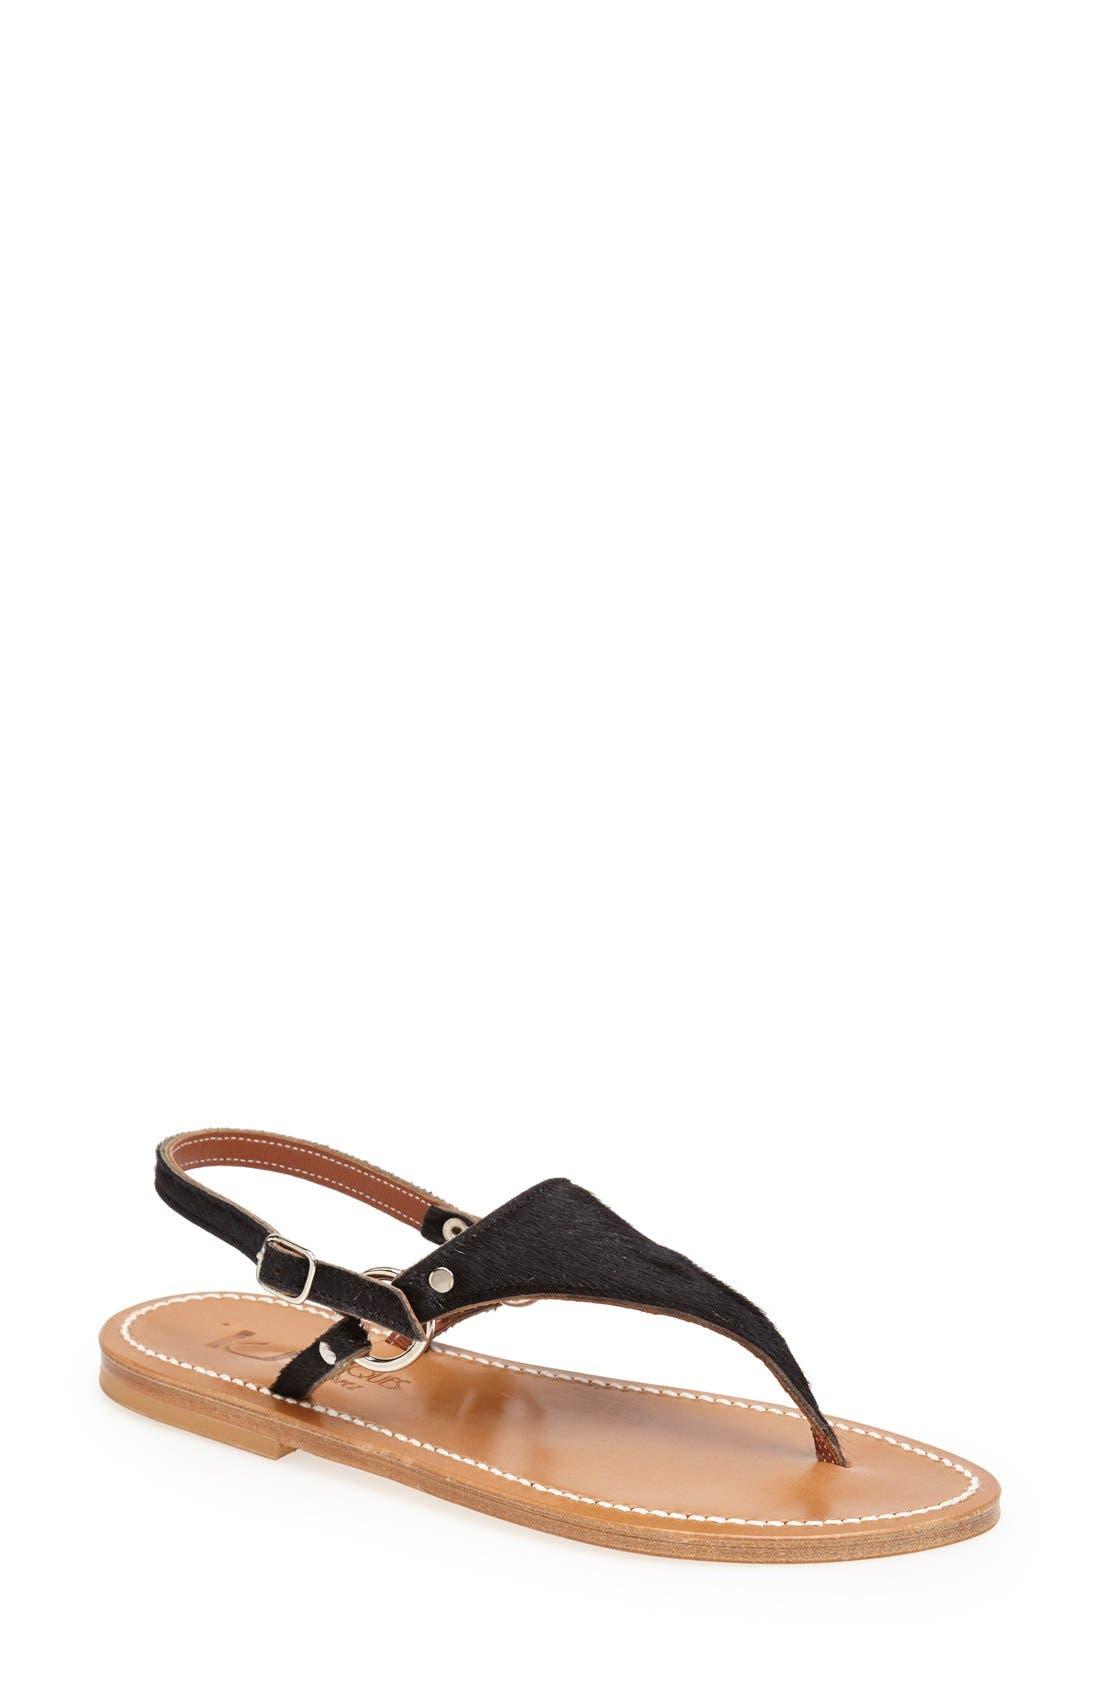 Alternate Image 1 Selected - K.Jacques St. Tropez 'Triton' V Strap Calf Hair Thong Sandal (Women)